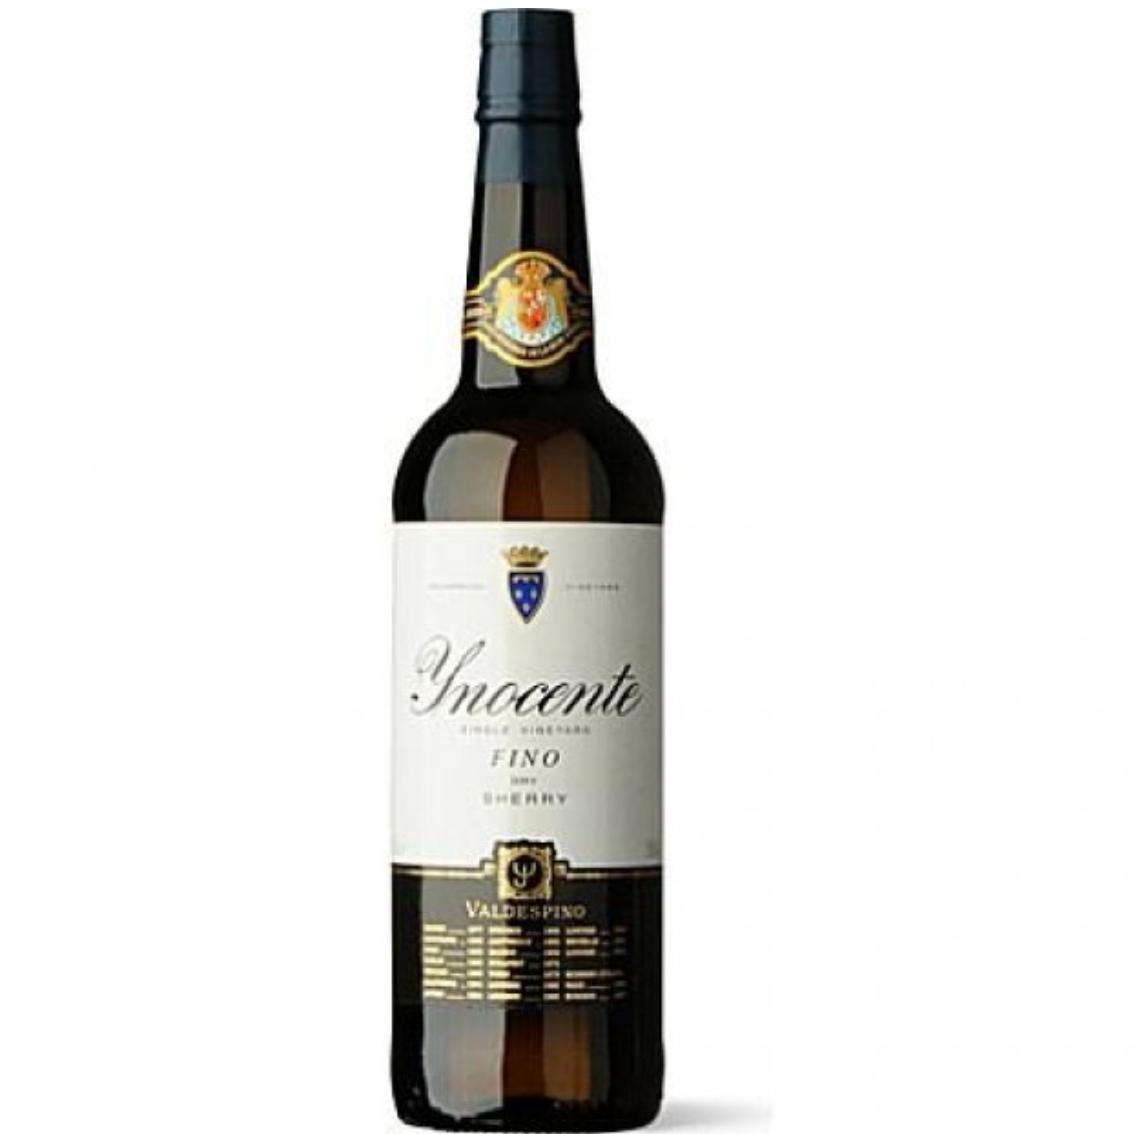 Sherry Fino 'Inocente' - Valdespino